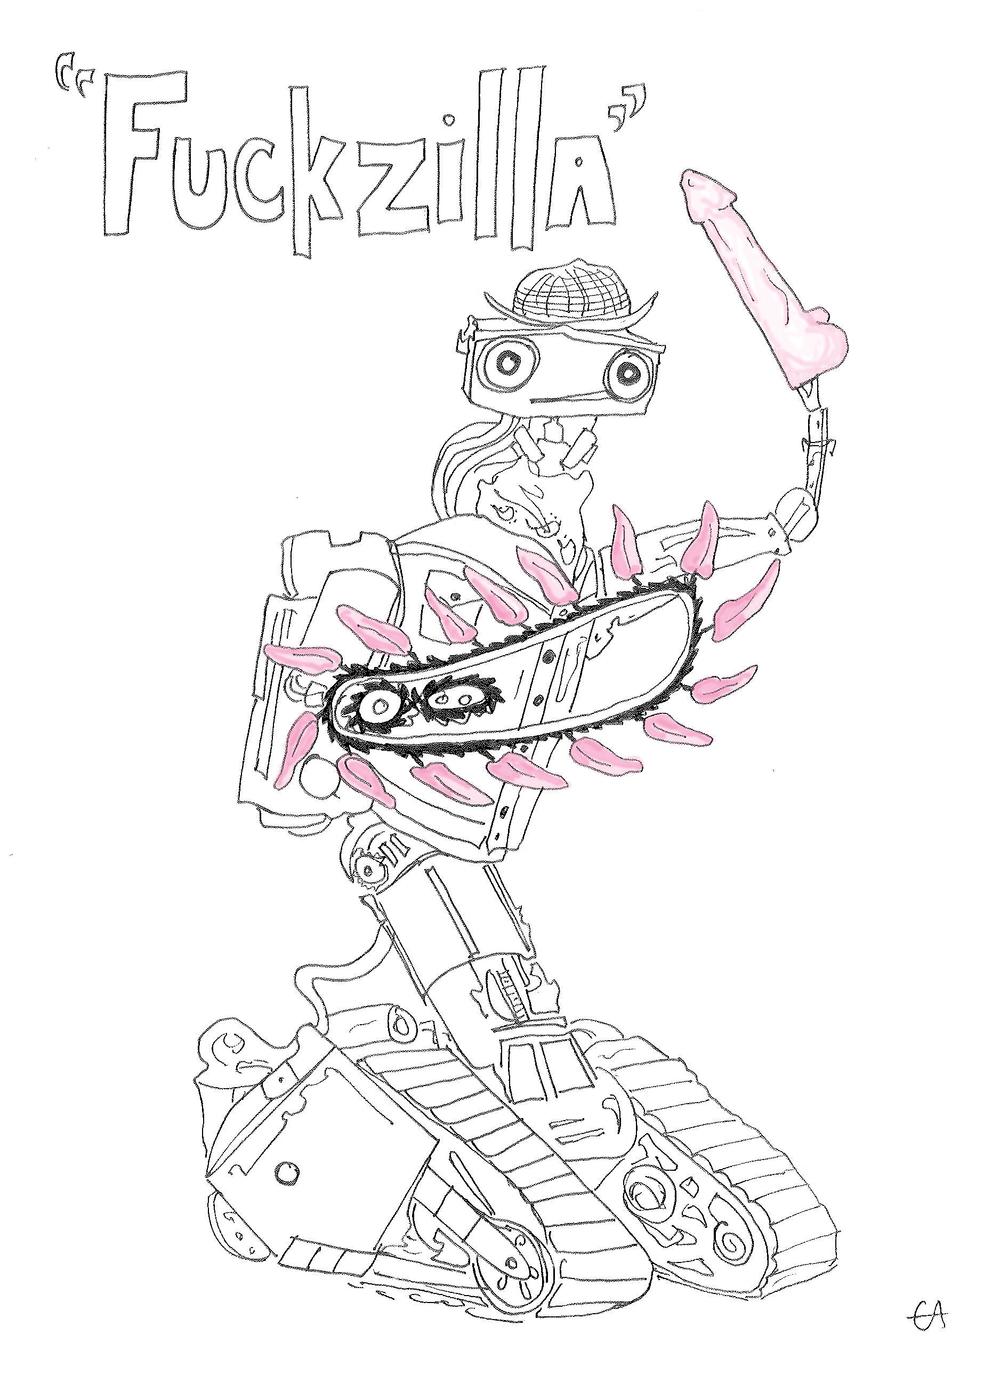 """Fuckzilla"" drawing based on kink.com robot."